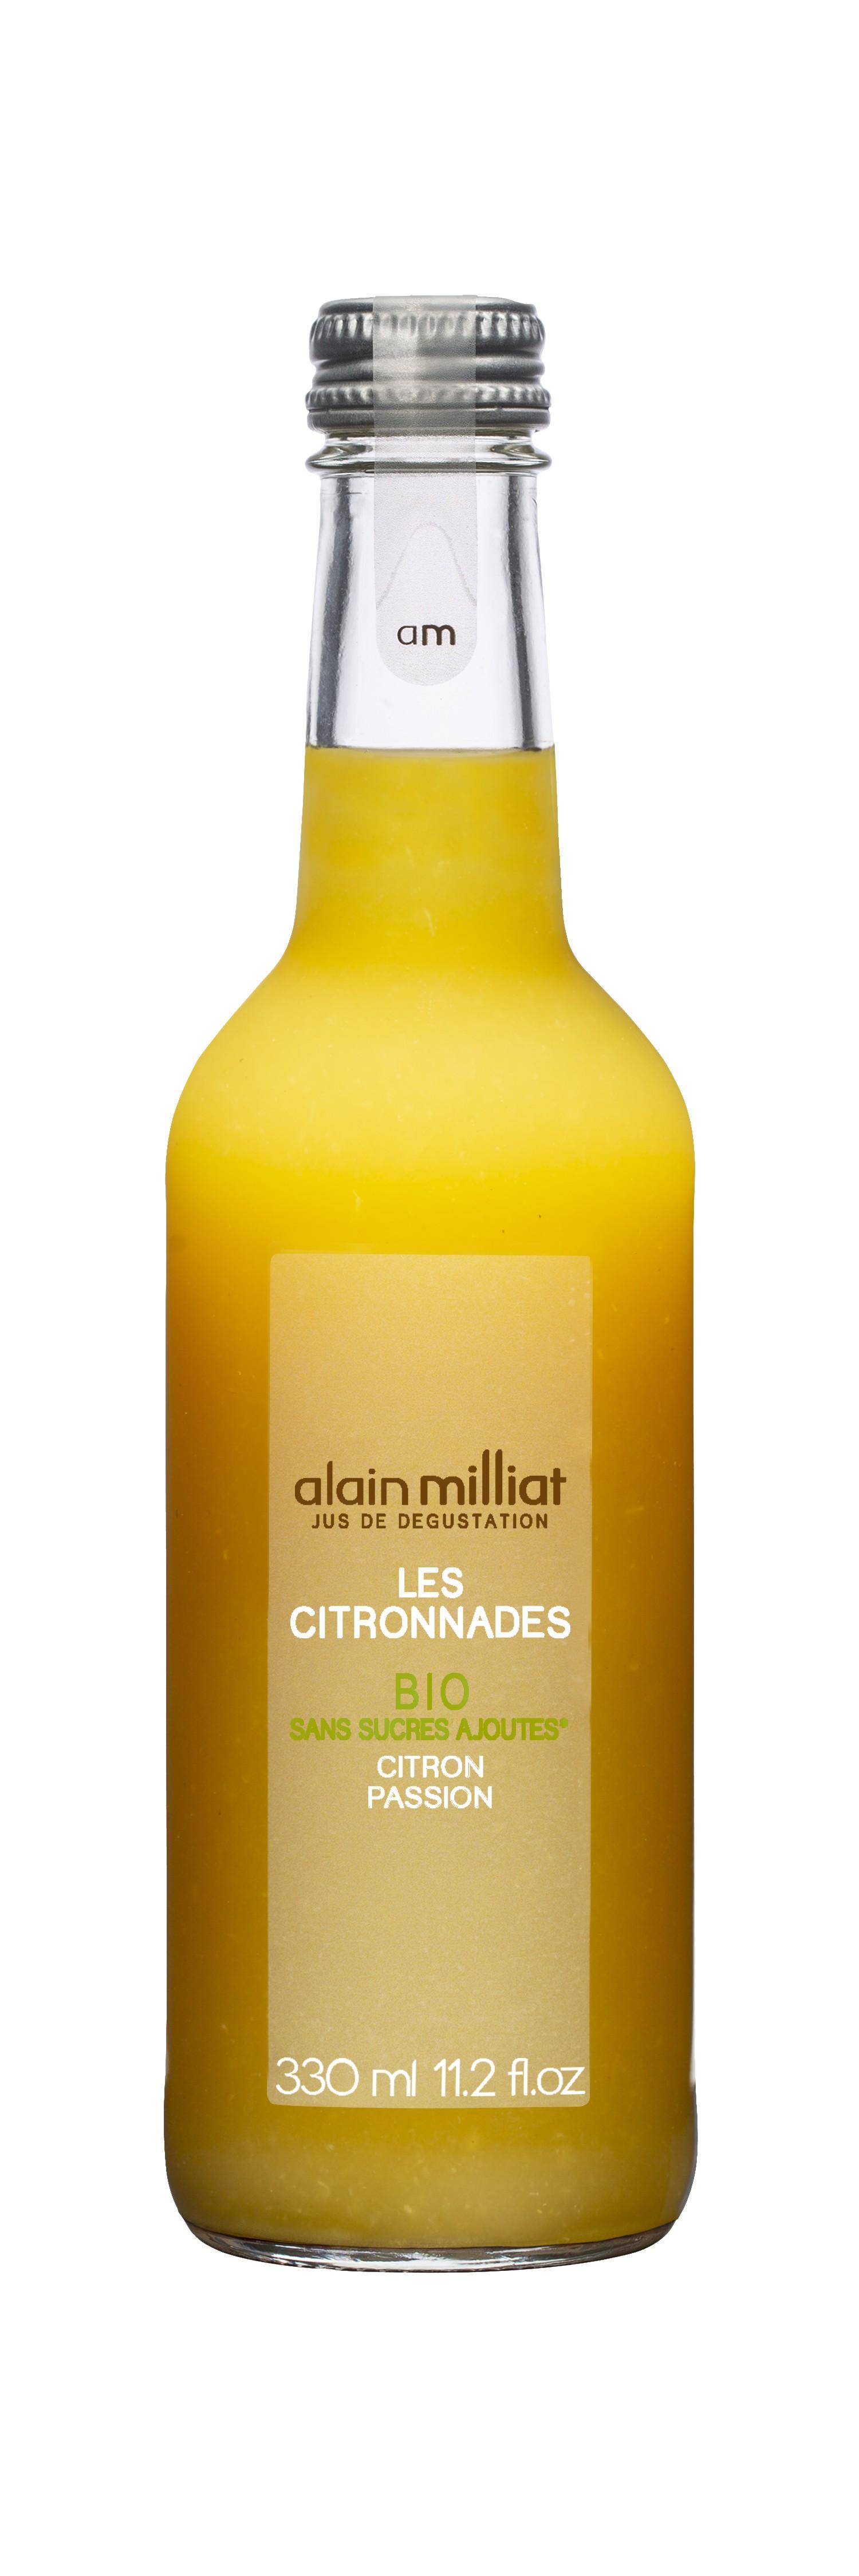 Citronnade Citron - Passion BIO, Alain Milliat (1 L)